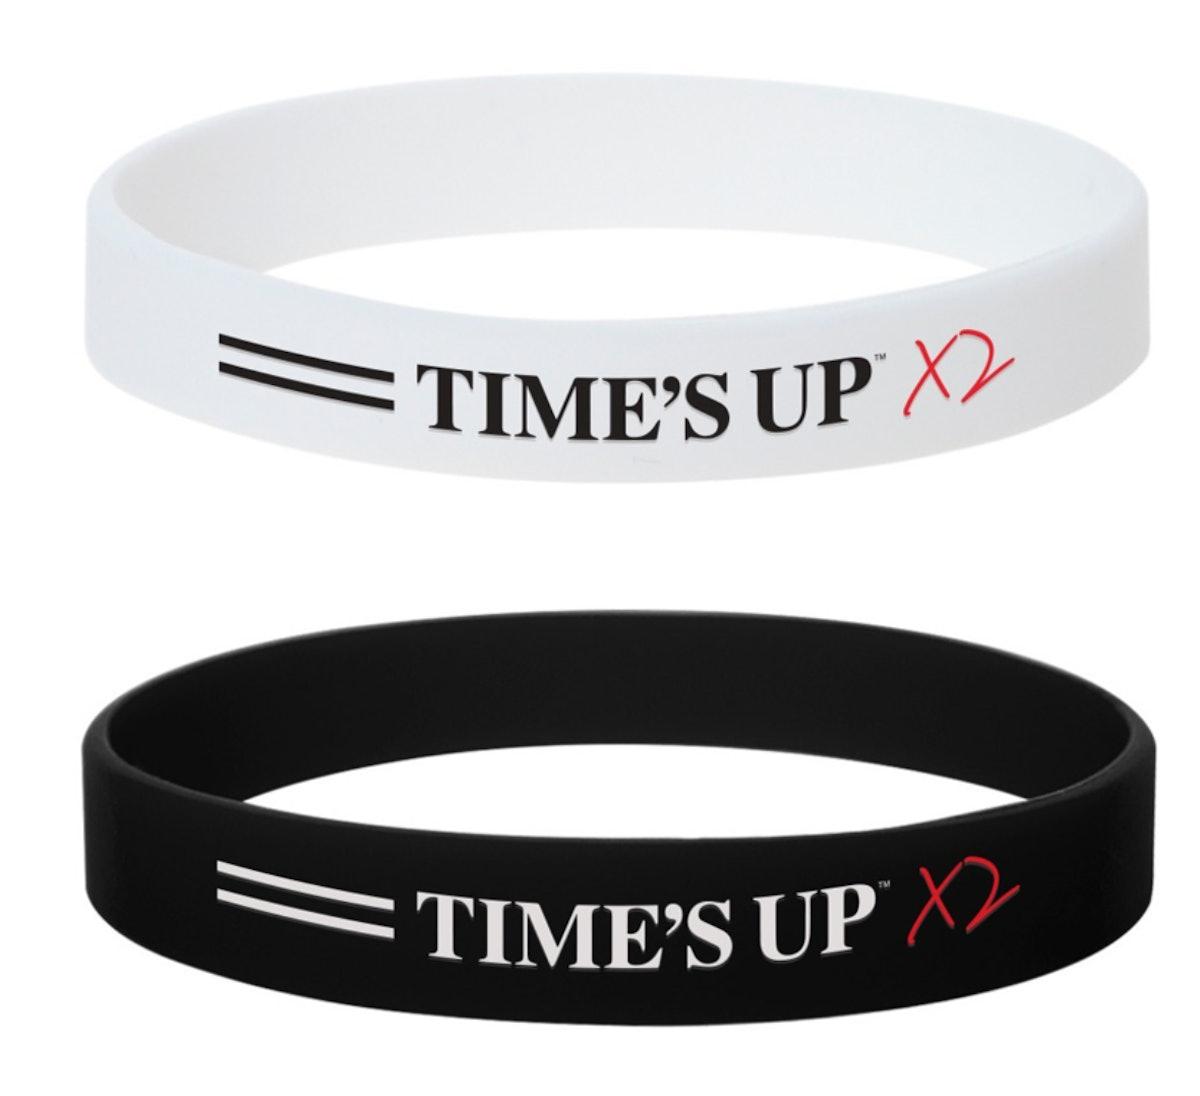 Time's Up x2 Silicon Bracelets